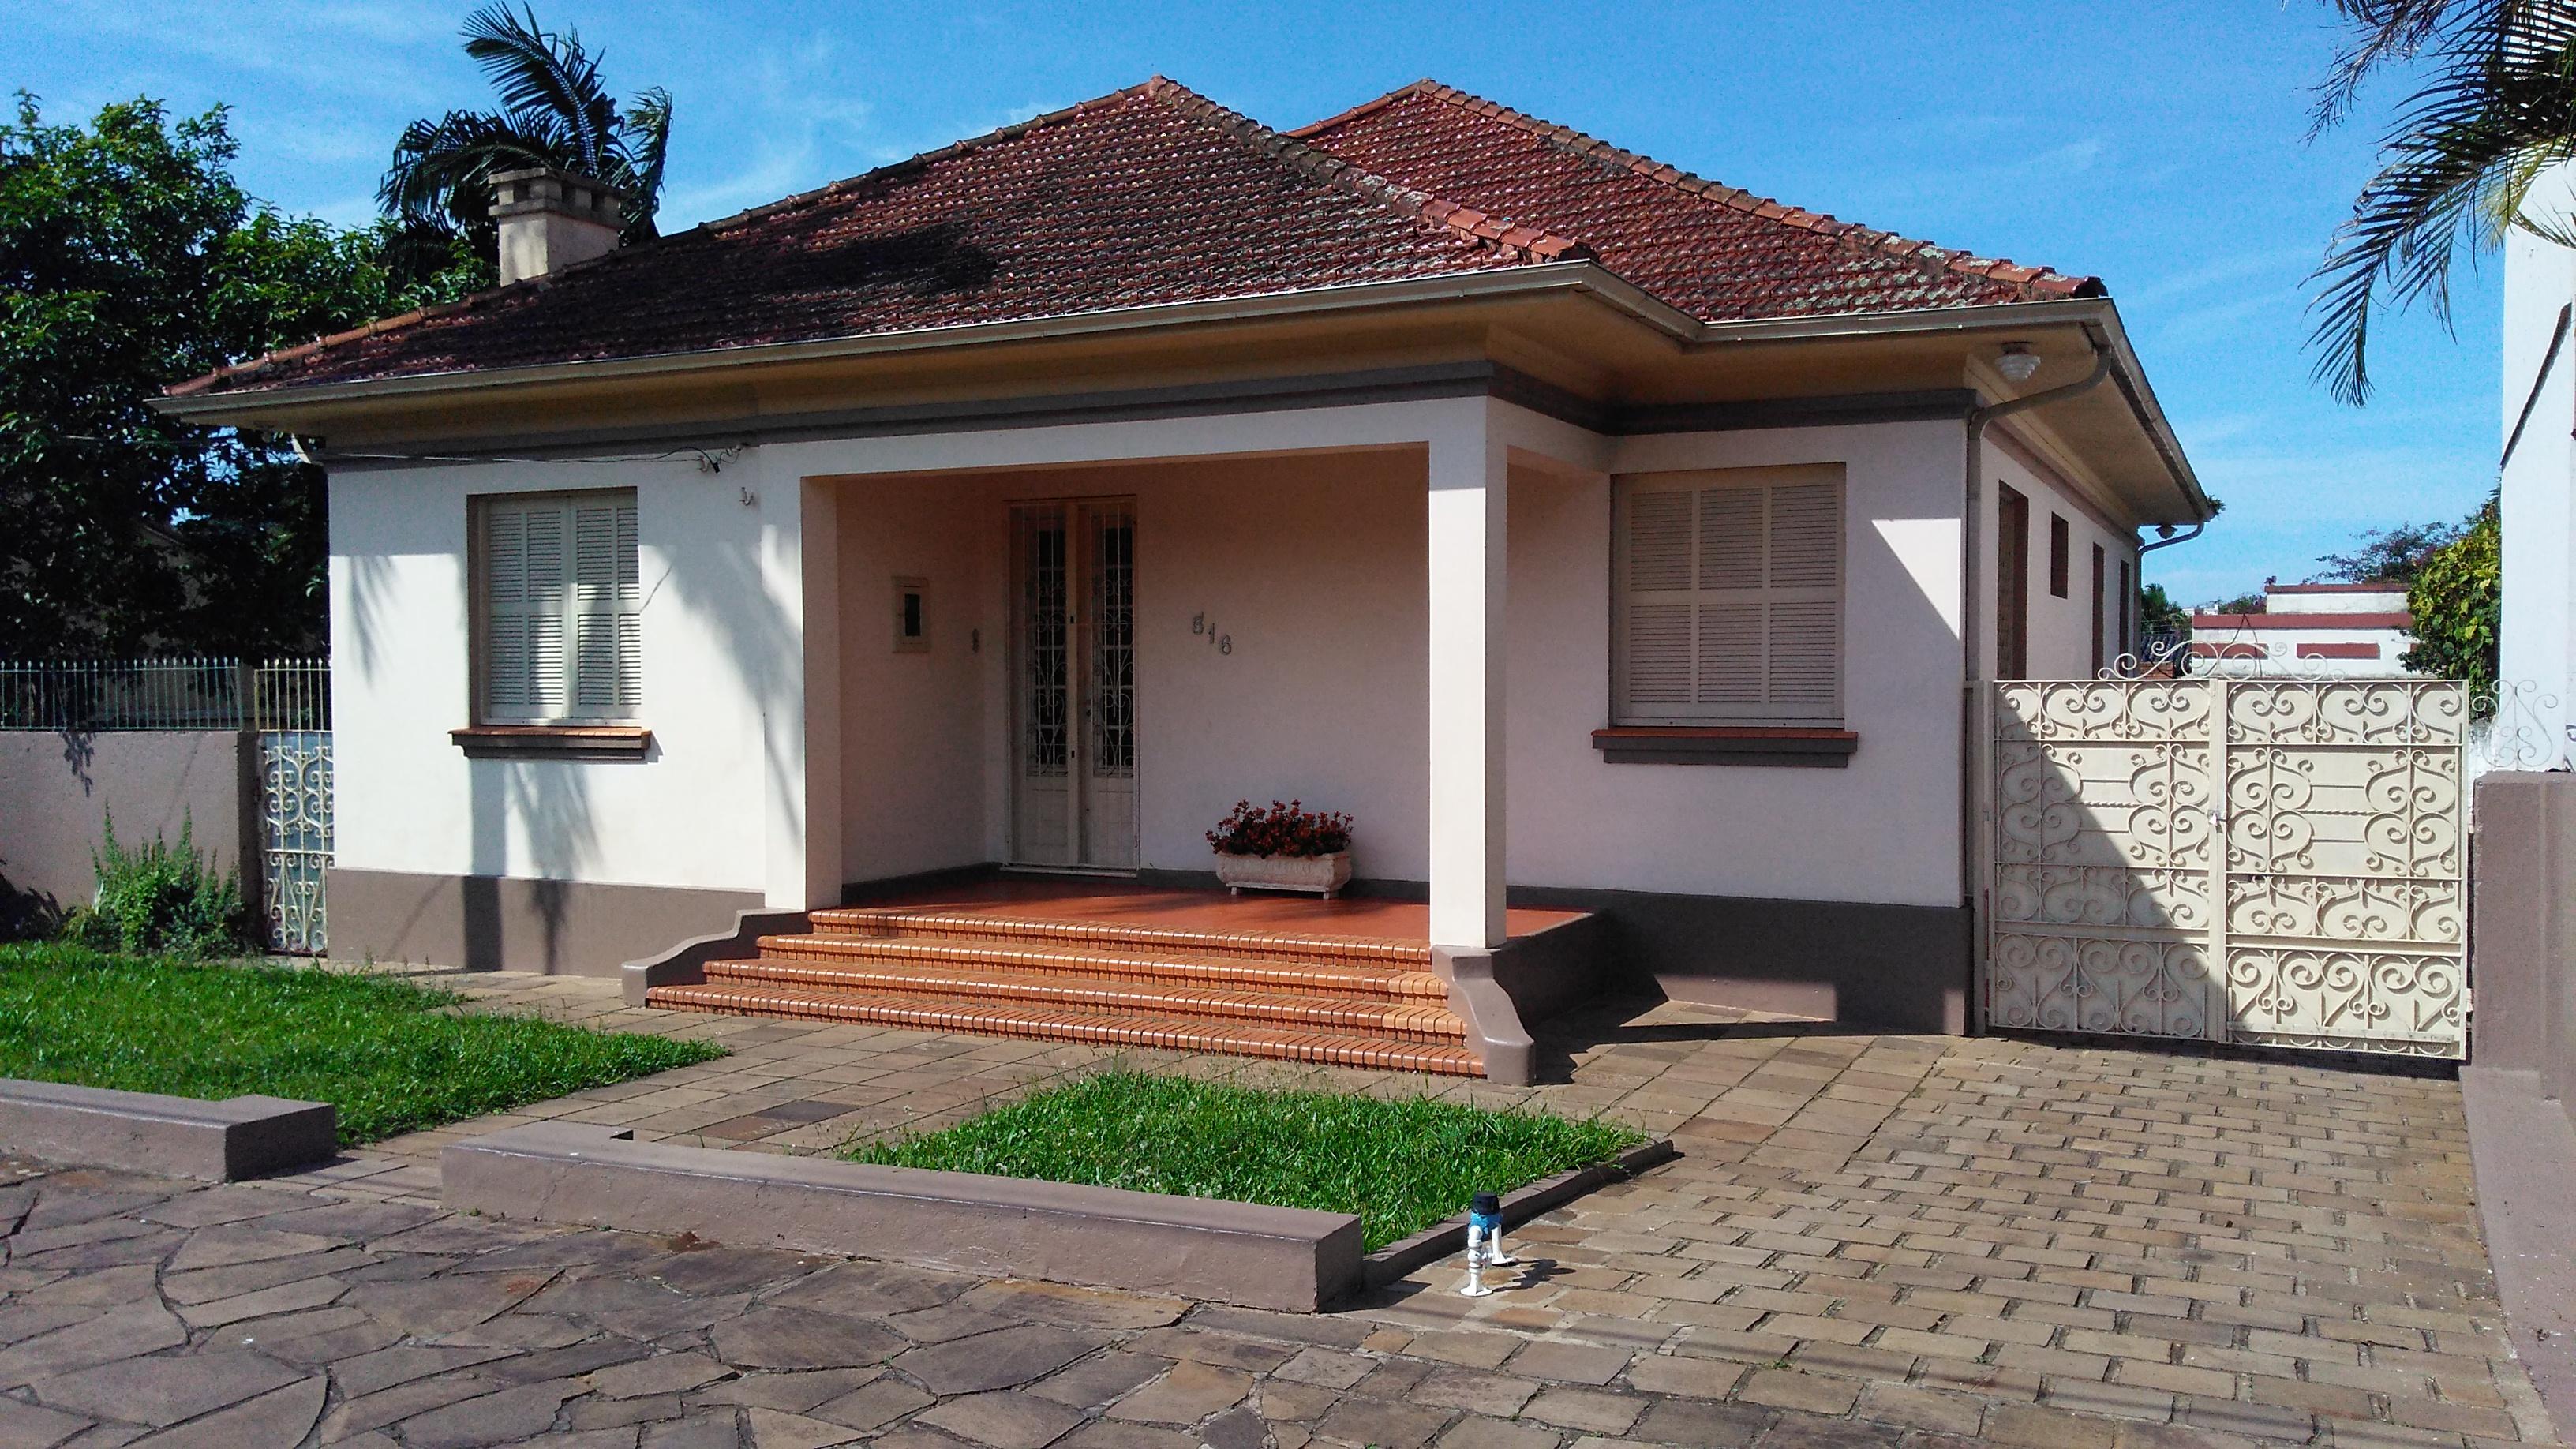 Casa Bairro Rio Branco